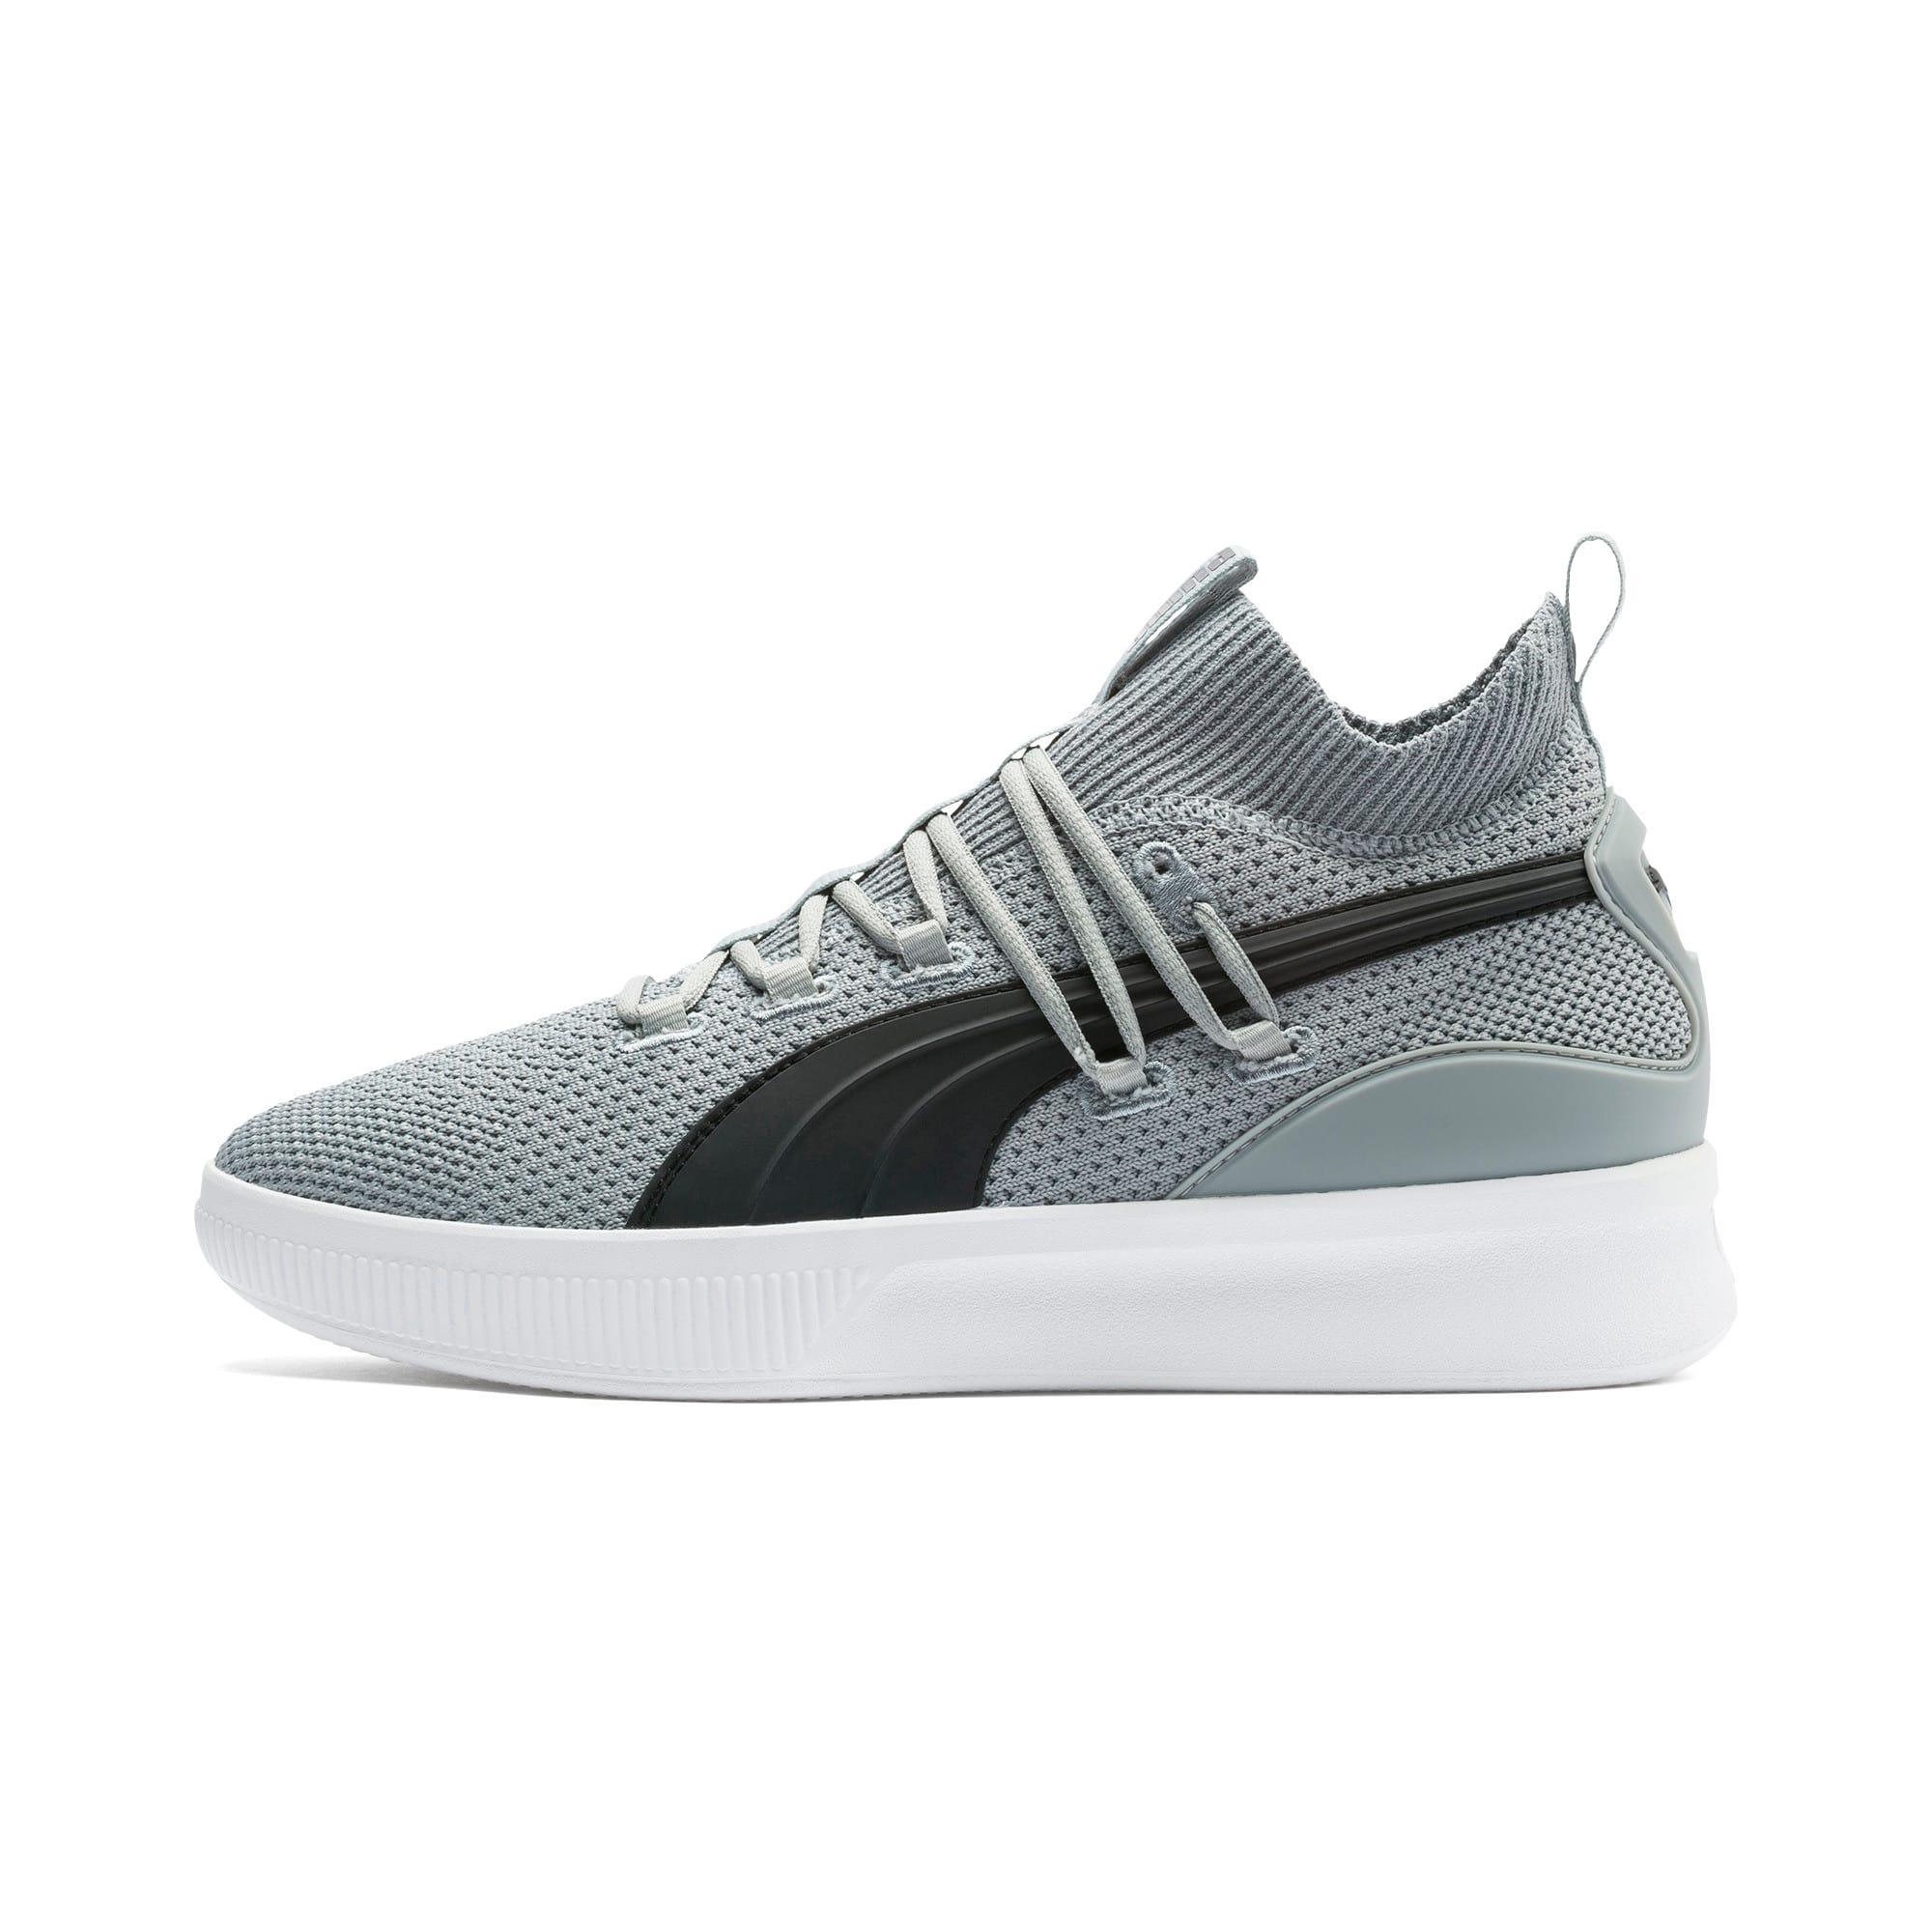 Thumbnail 1 of Clyde Court Core Basketball Shoes, Quarry-Puma Black, medium